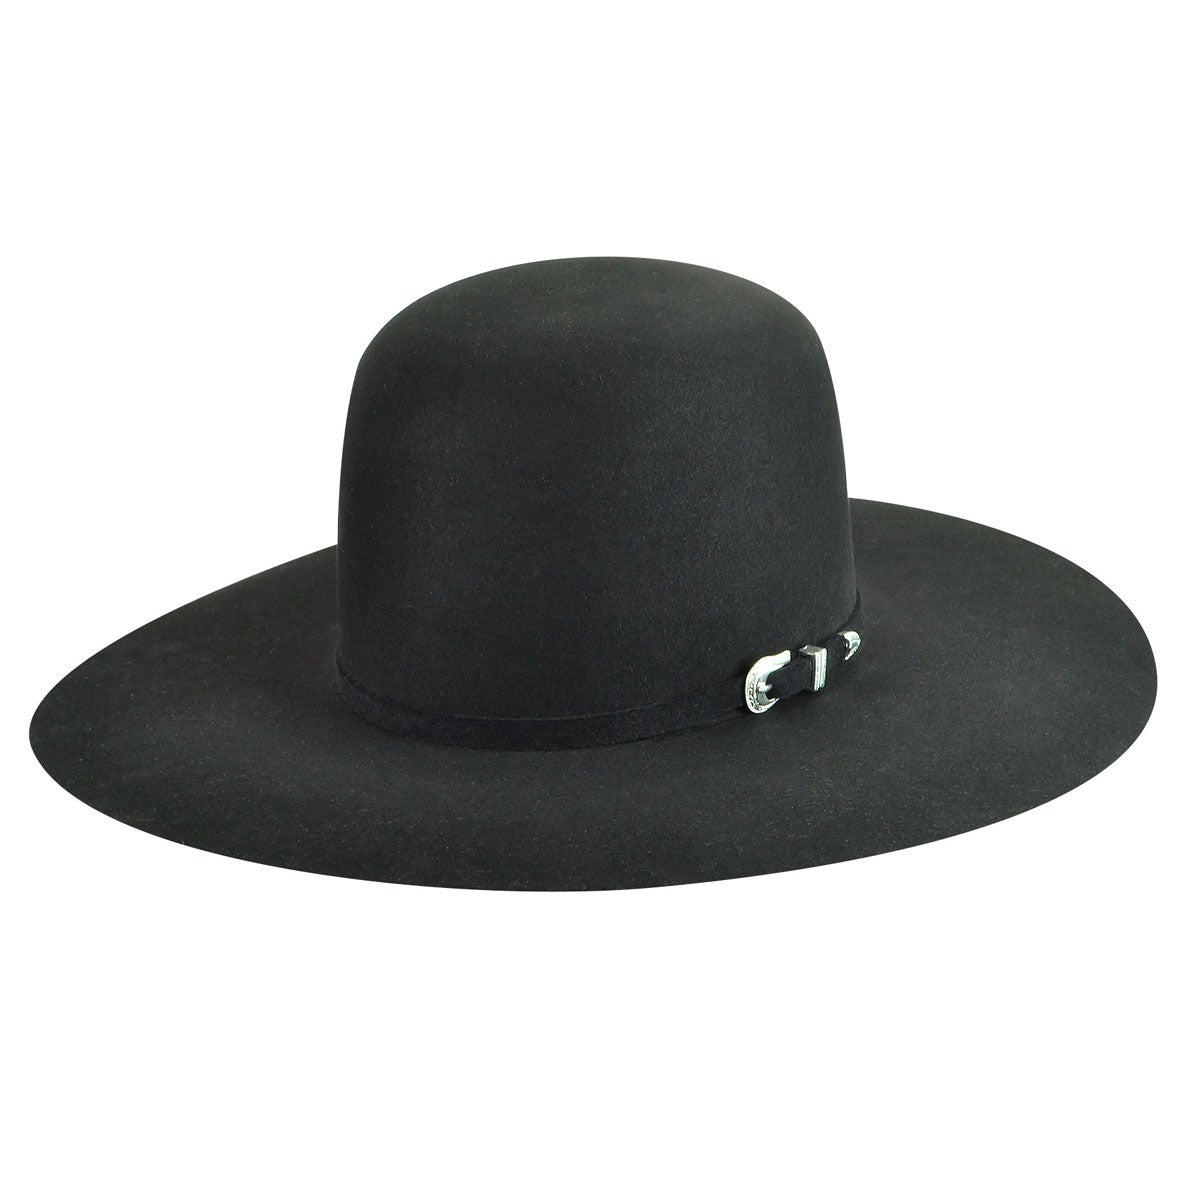 Bailey Western Courtright 7X Open Western Hat in Black